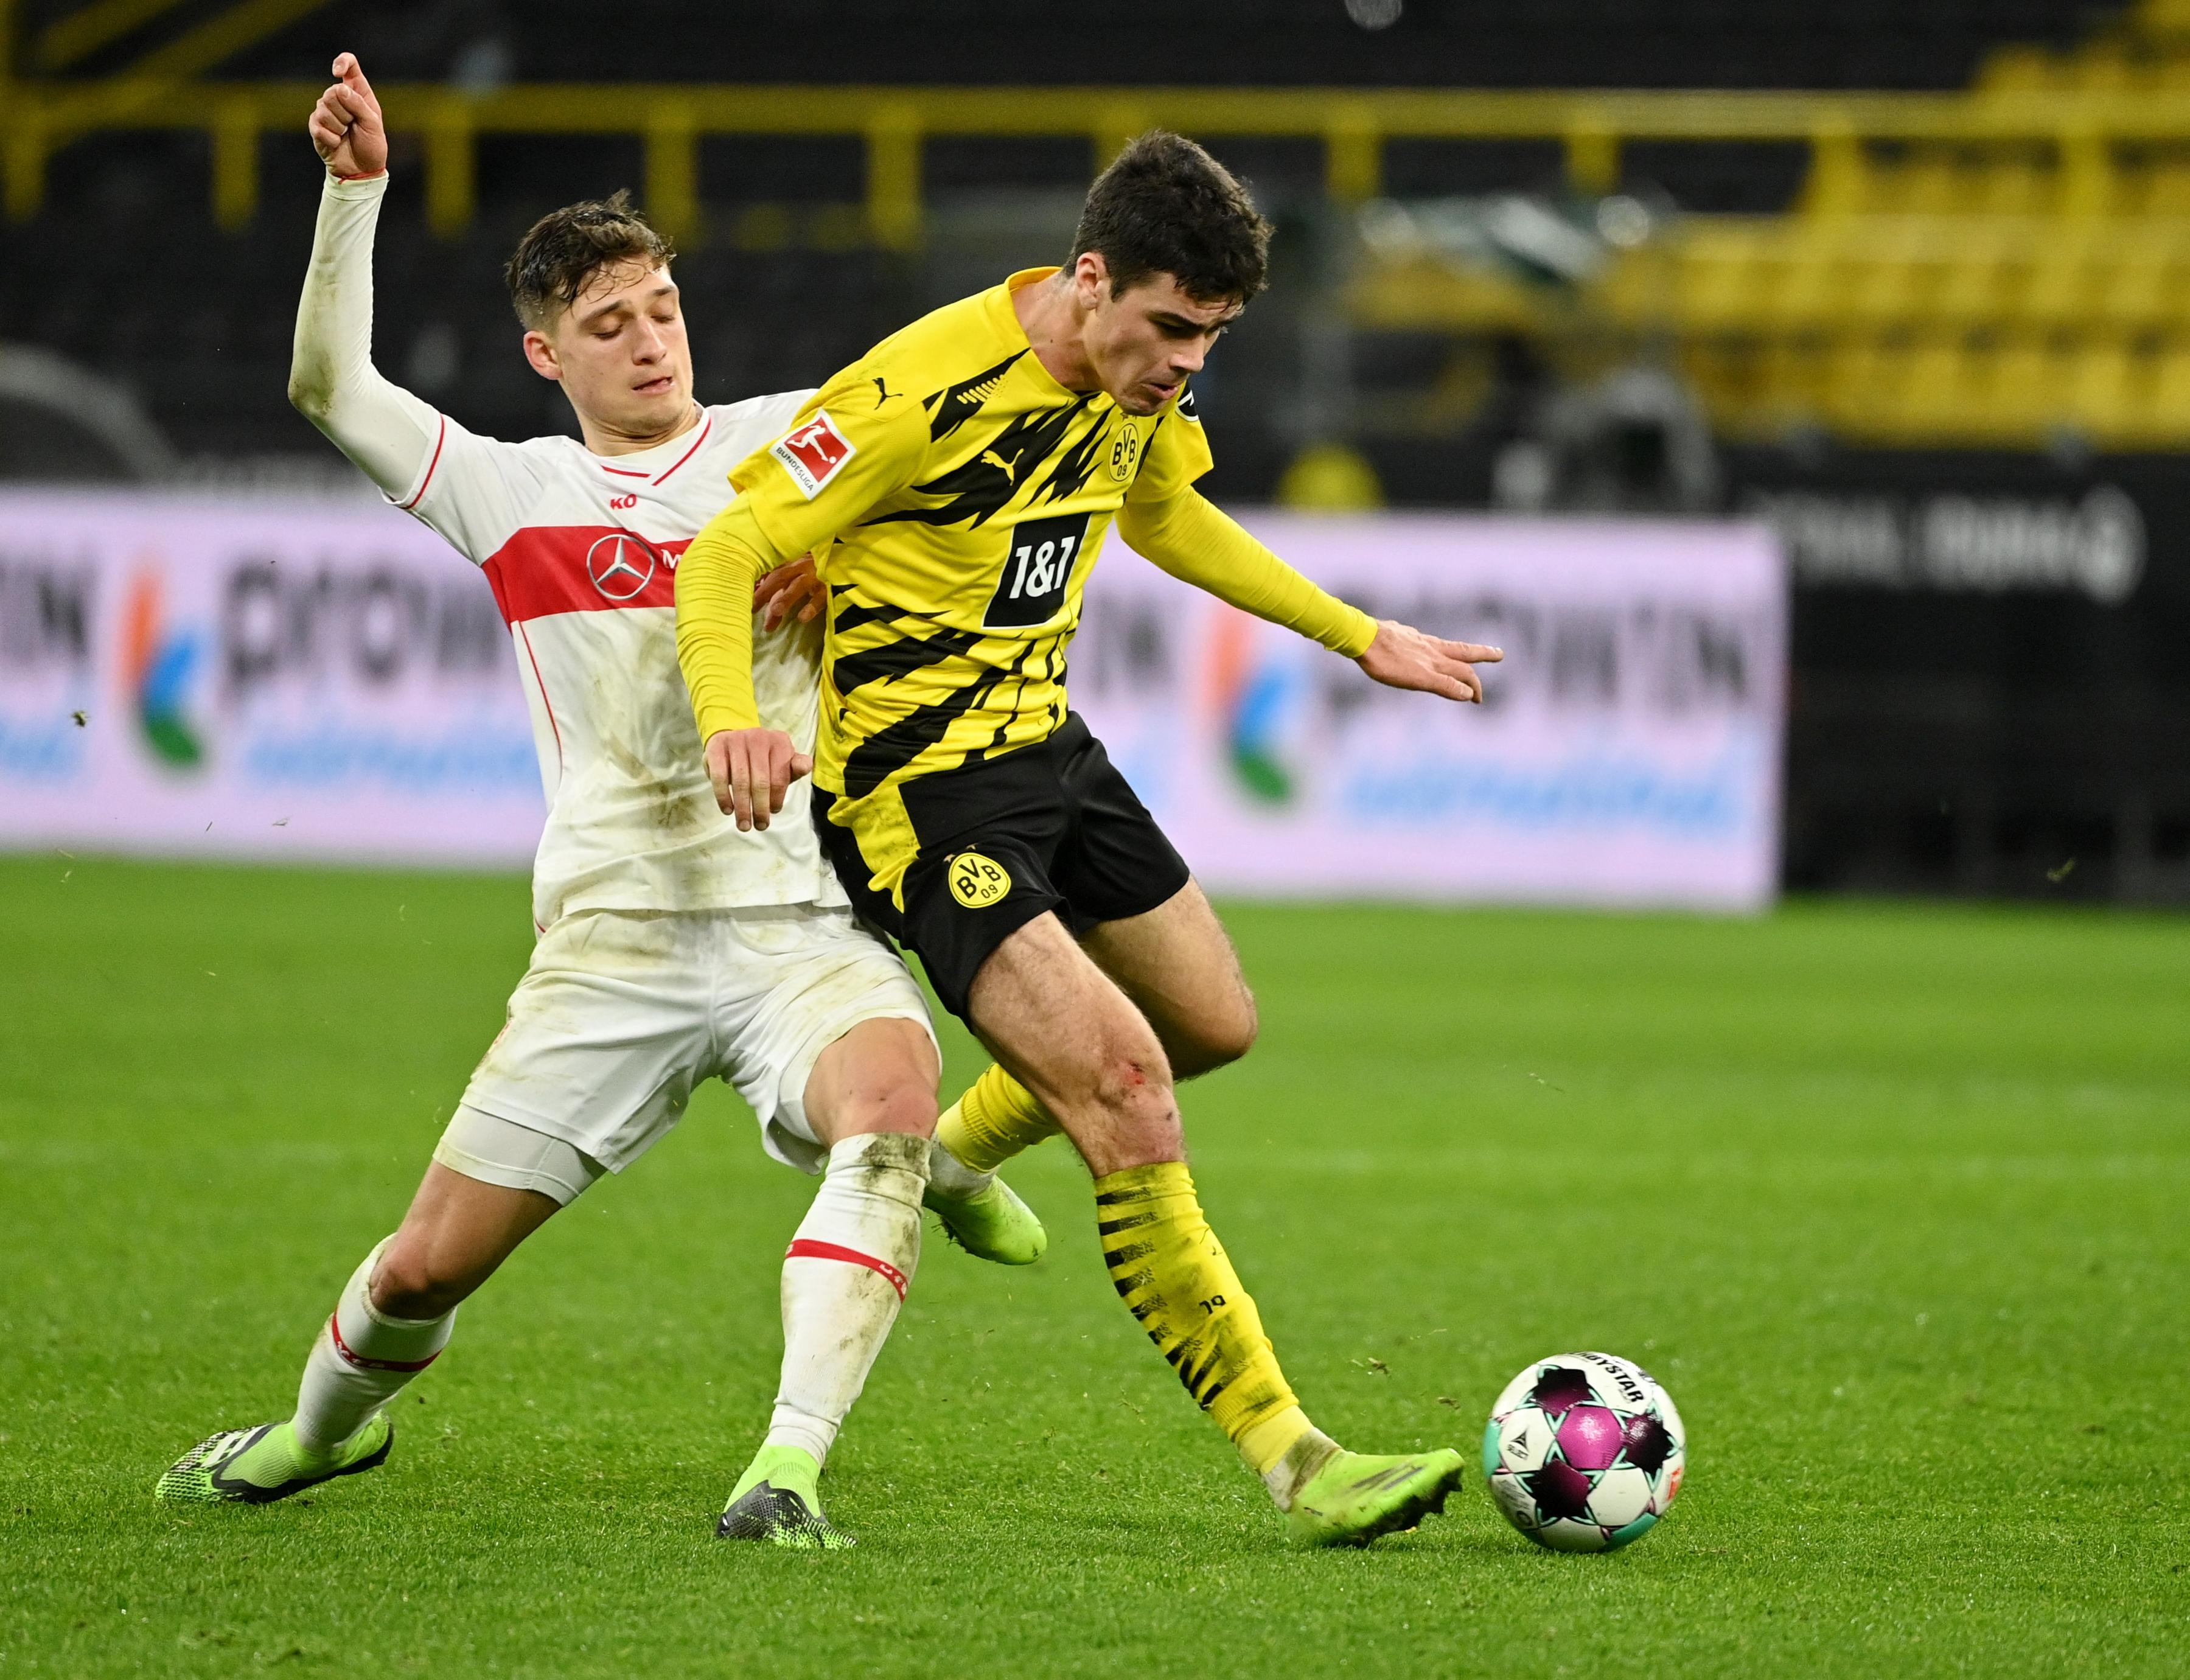 Borussia Dortmund's Giovanni Reyna in action with VfB Stuttgart's Mateo Klimowicz. Photo: Reuters